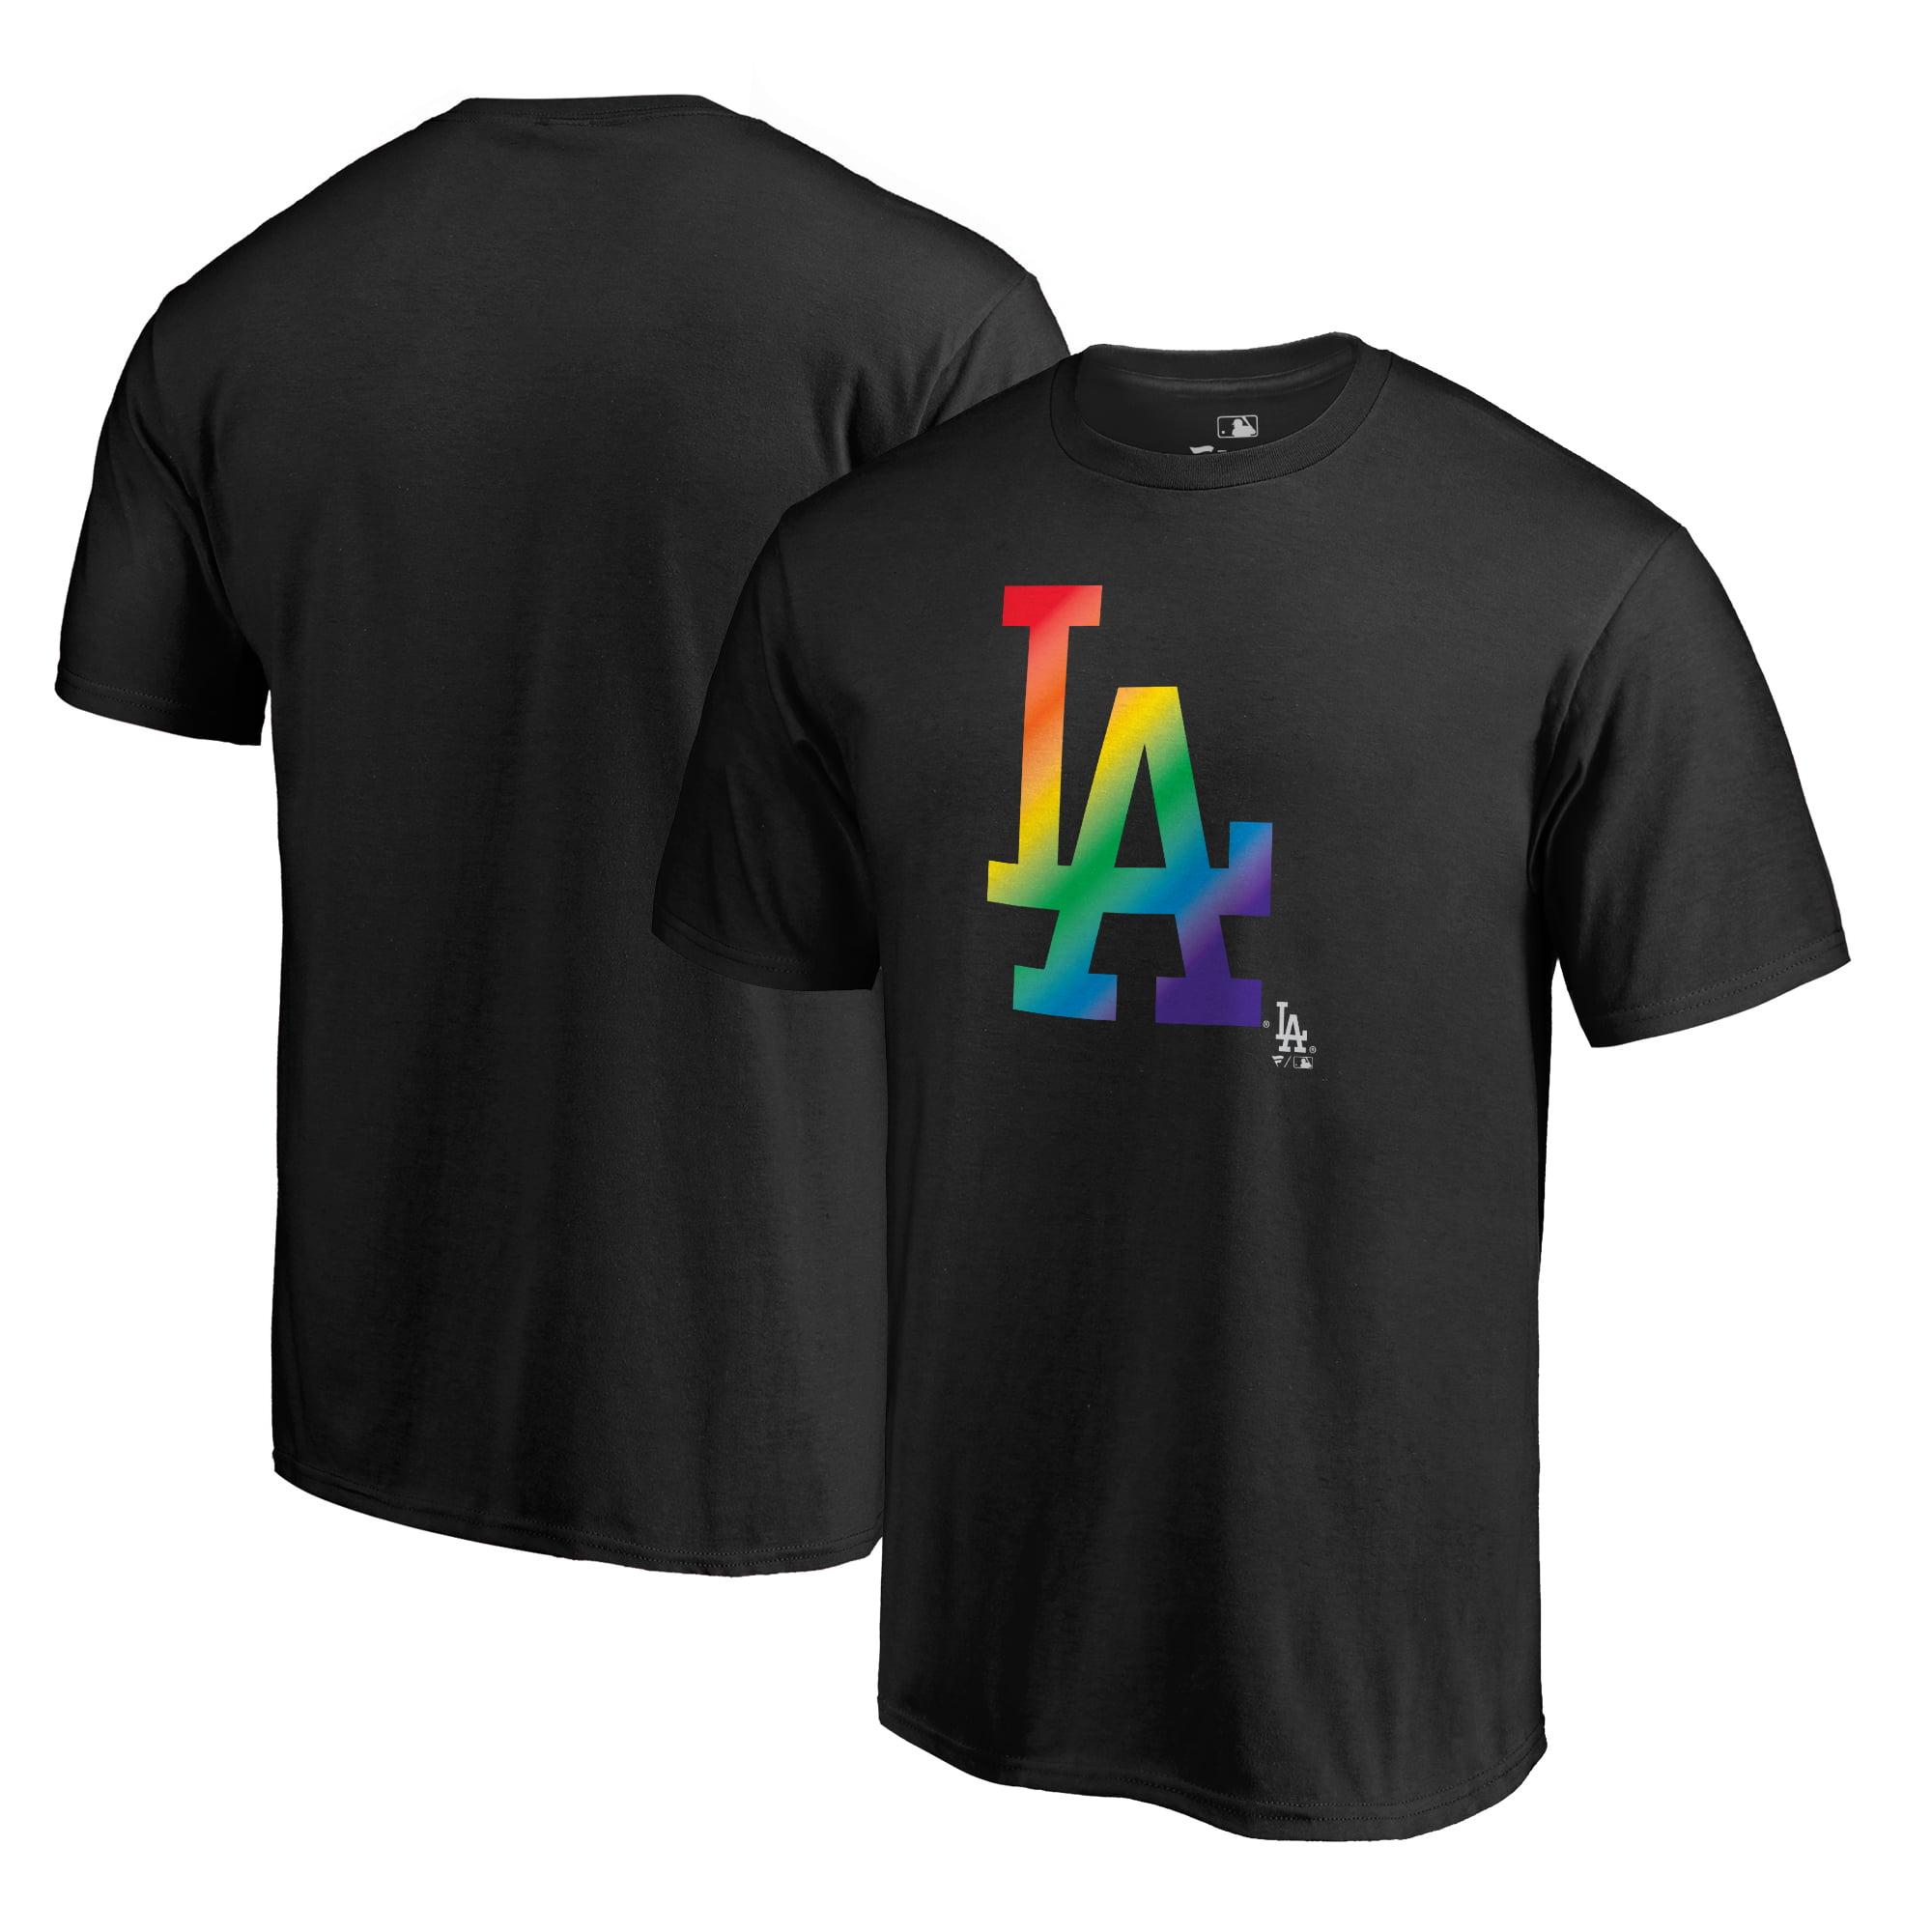 Los Angeles Dodgers Fanatics Branded Pride T-Shirt - Black